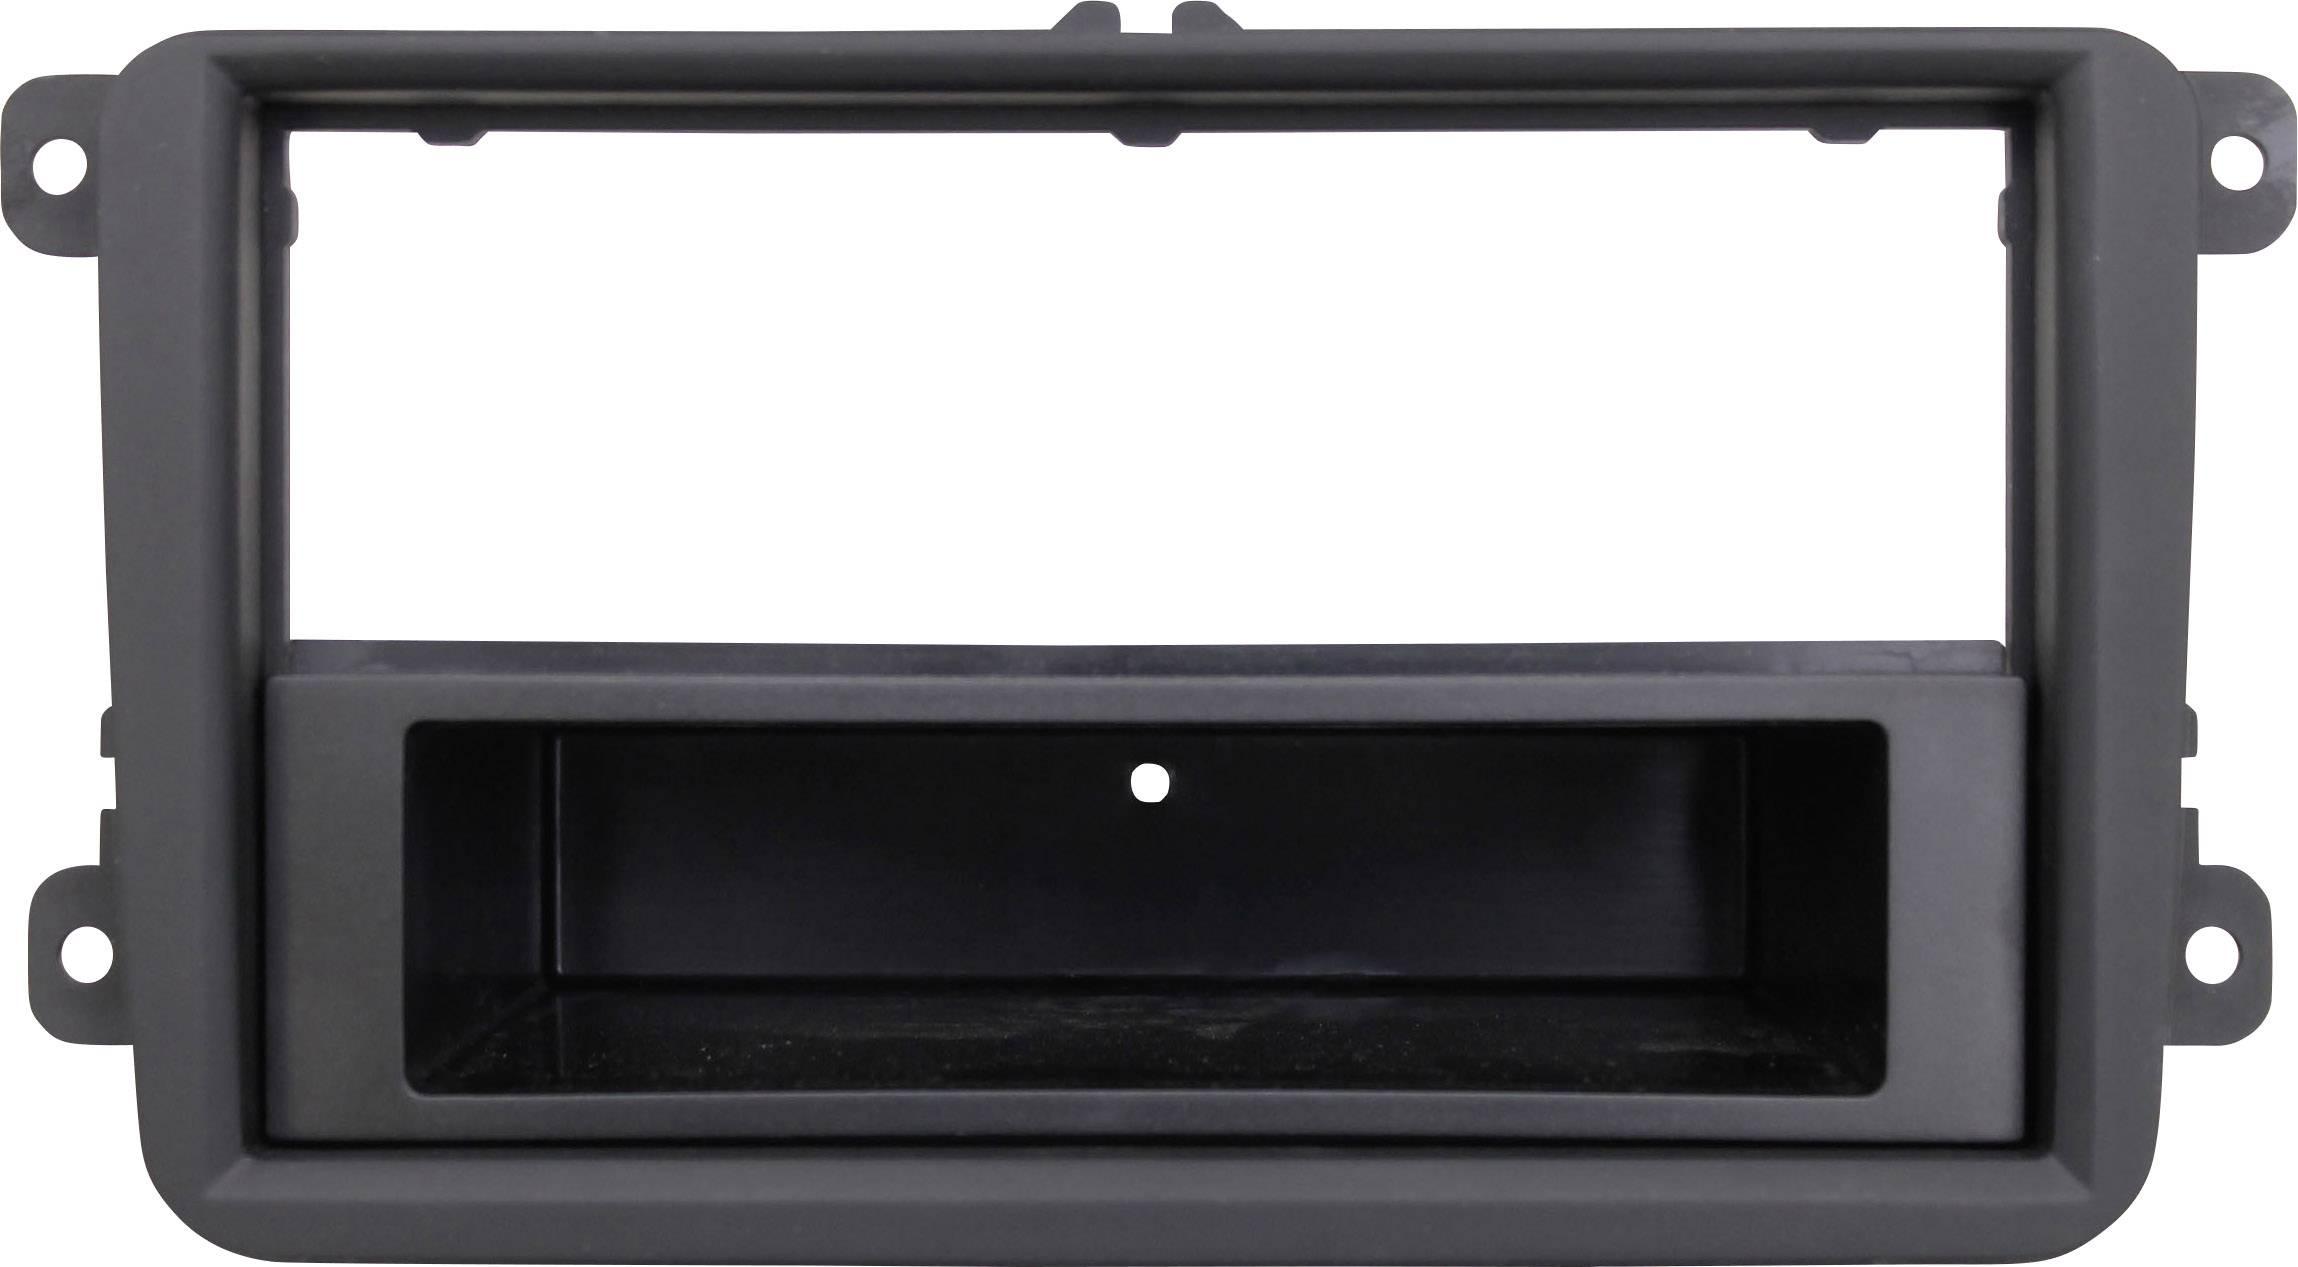 Montážny rámik na autorádio pre Volkswagen Golf V, Volkswagen Touran, AIV 10C621